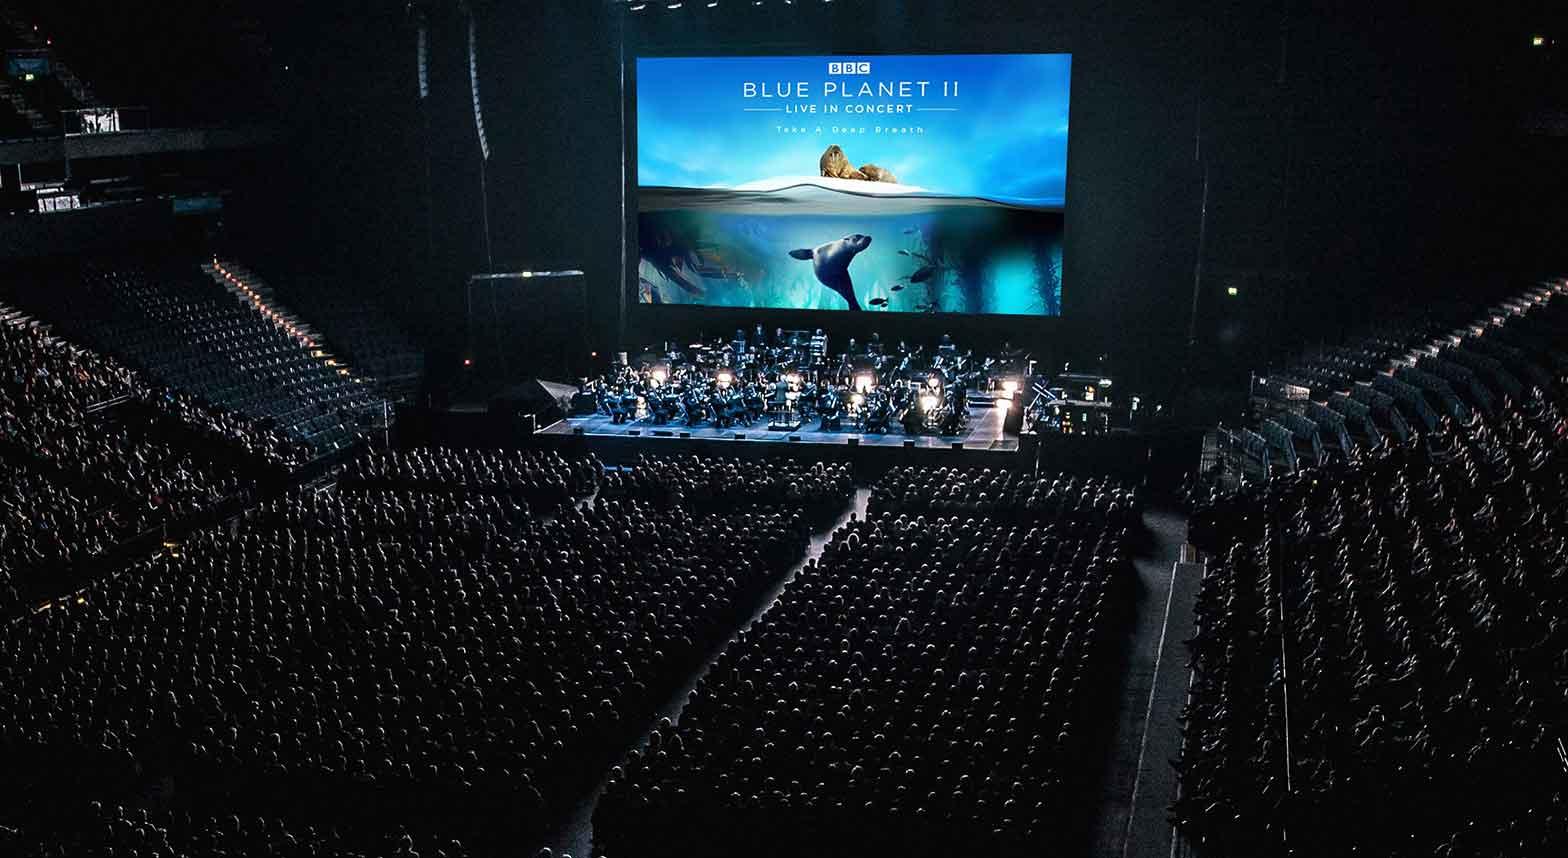 blue-planet-image1.jpg